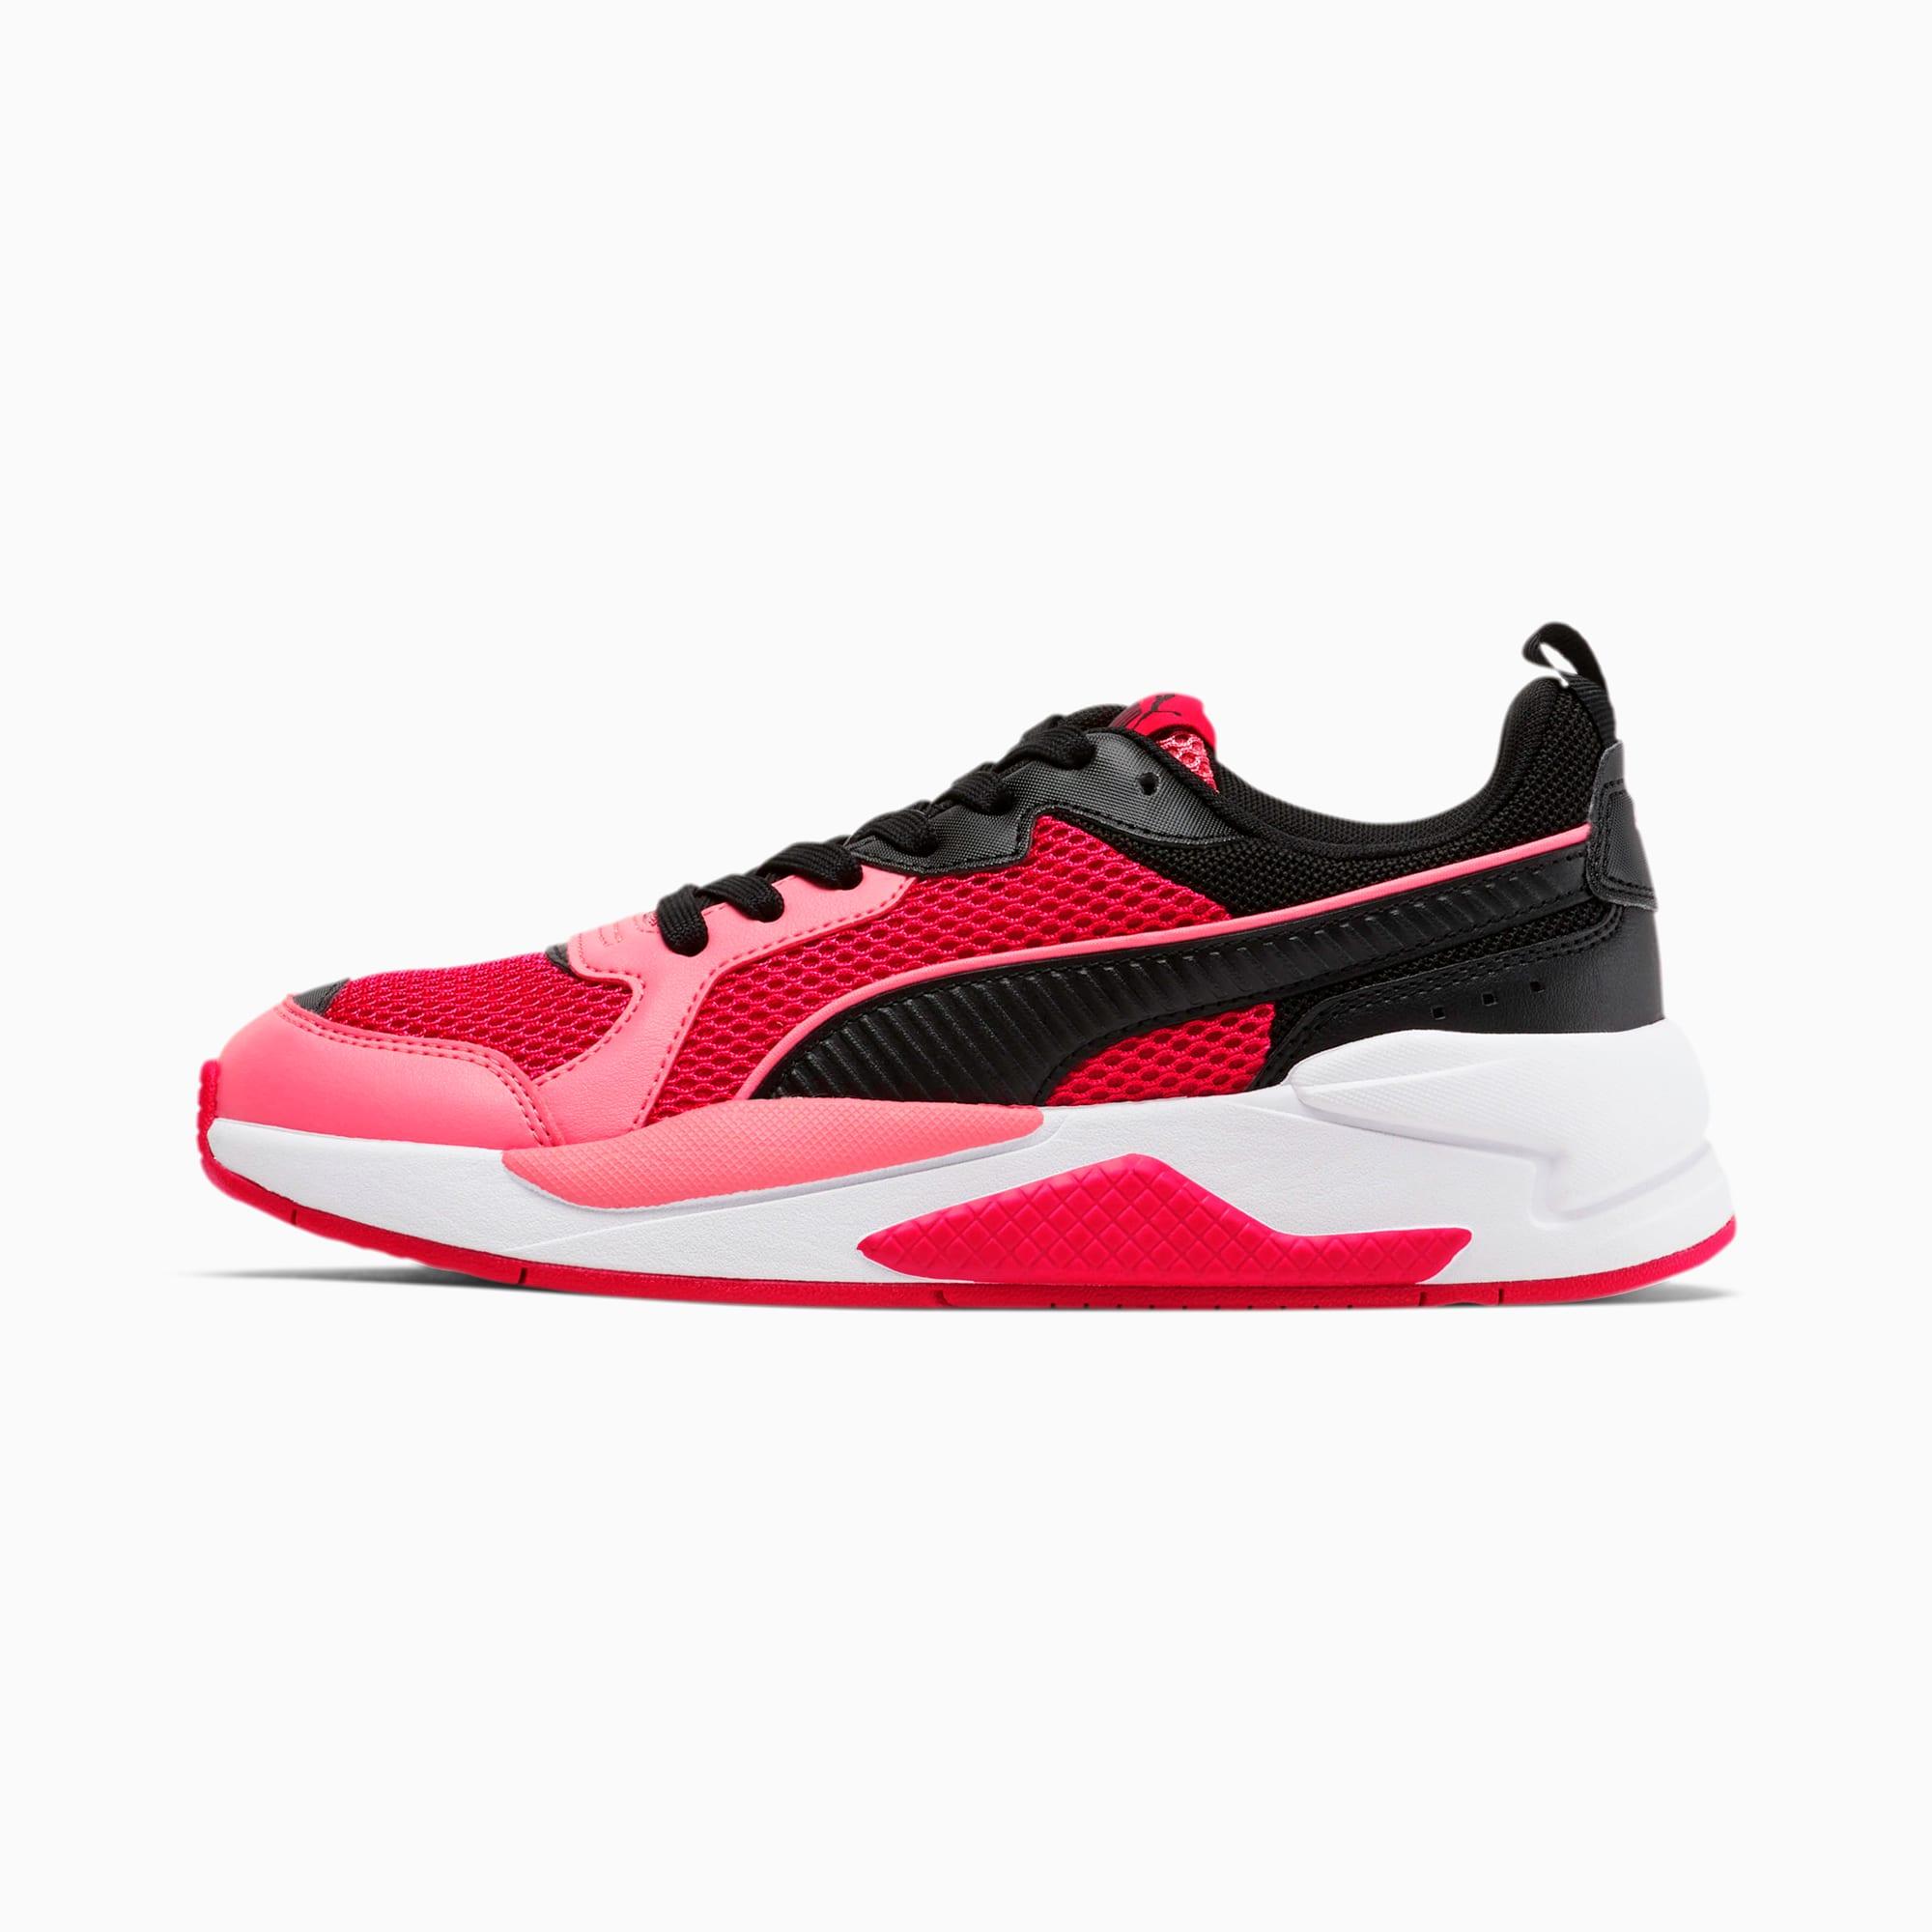 X-RAY Glitch Women's Sneakers